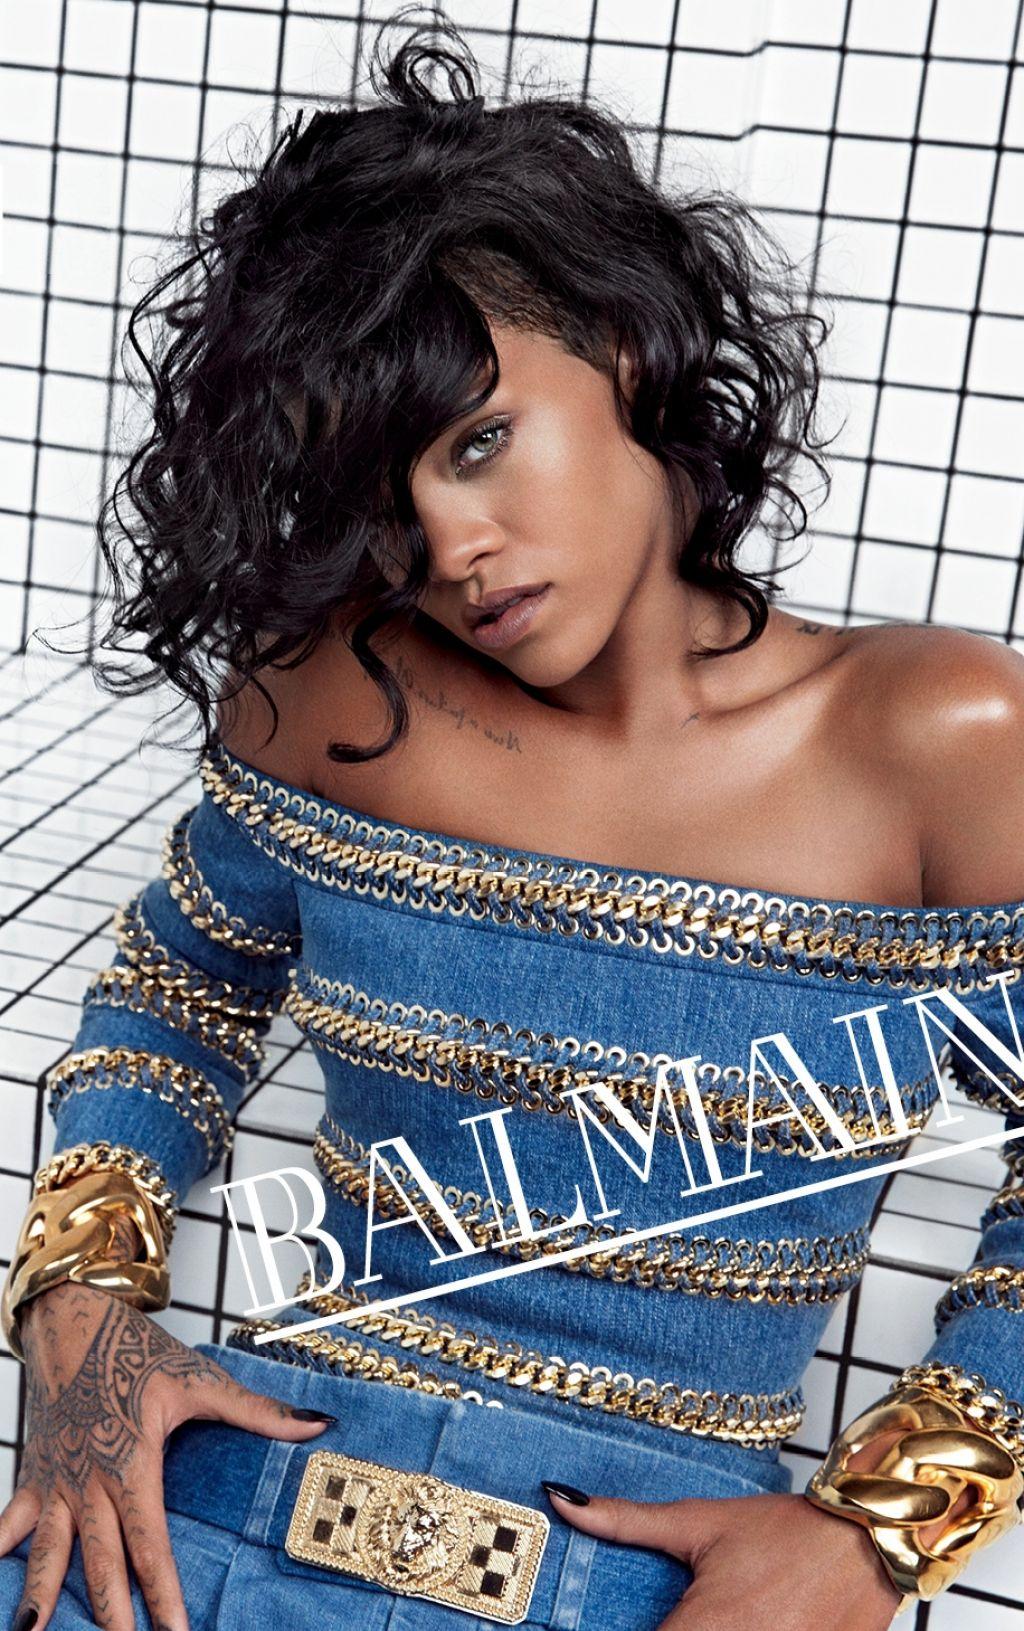 Rihanna Hollywood Star Latest Hd Wallpapers 2013 ... |Rihanna 2013